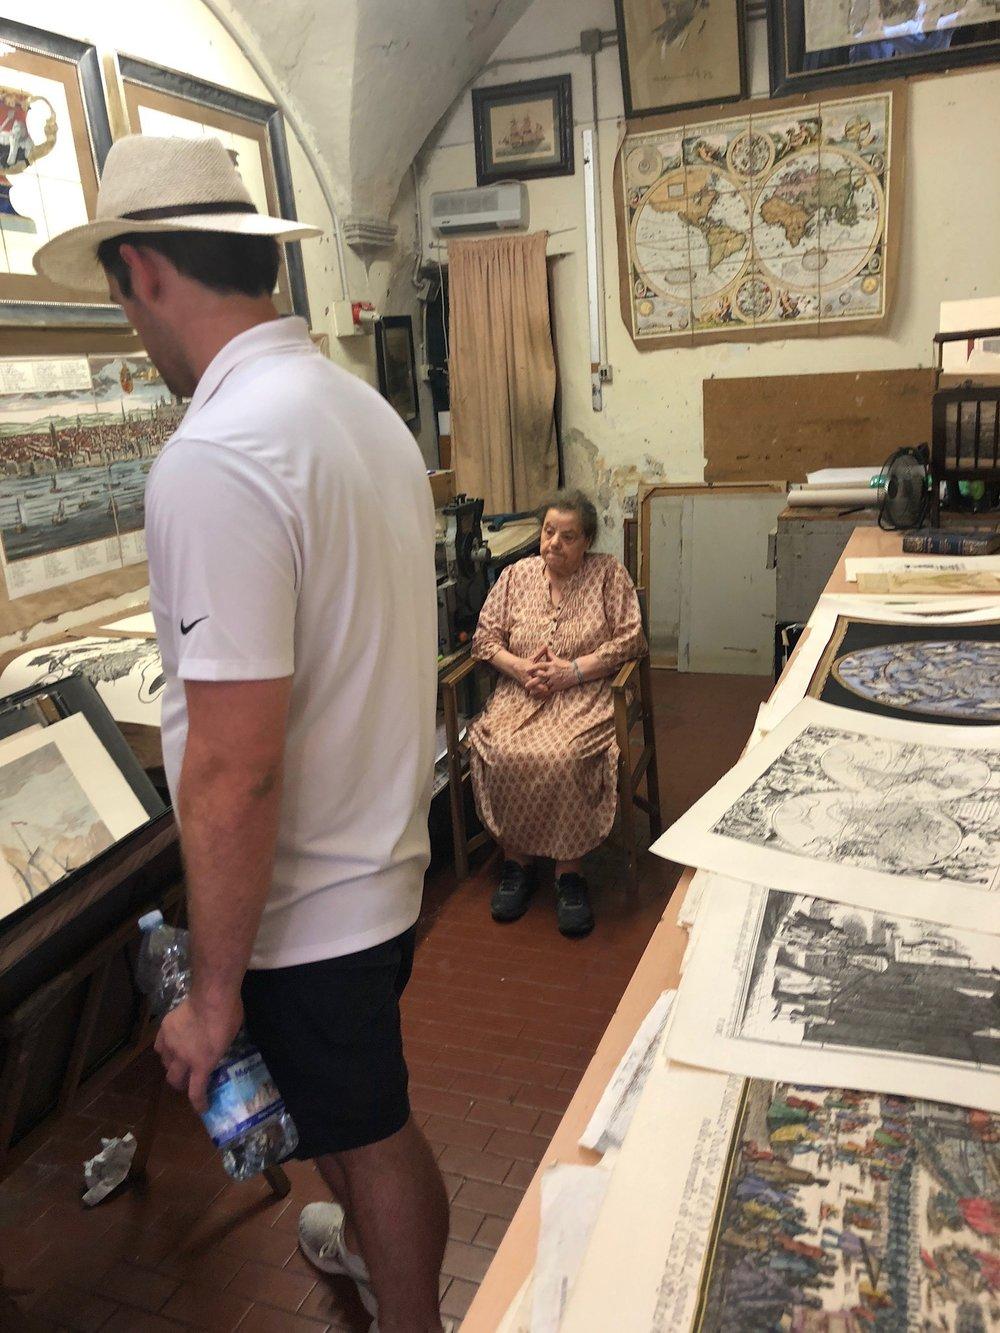 A print-making artisan shop in Florence.